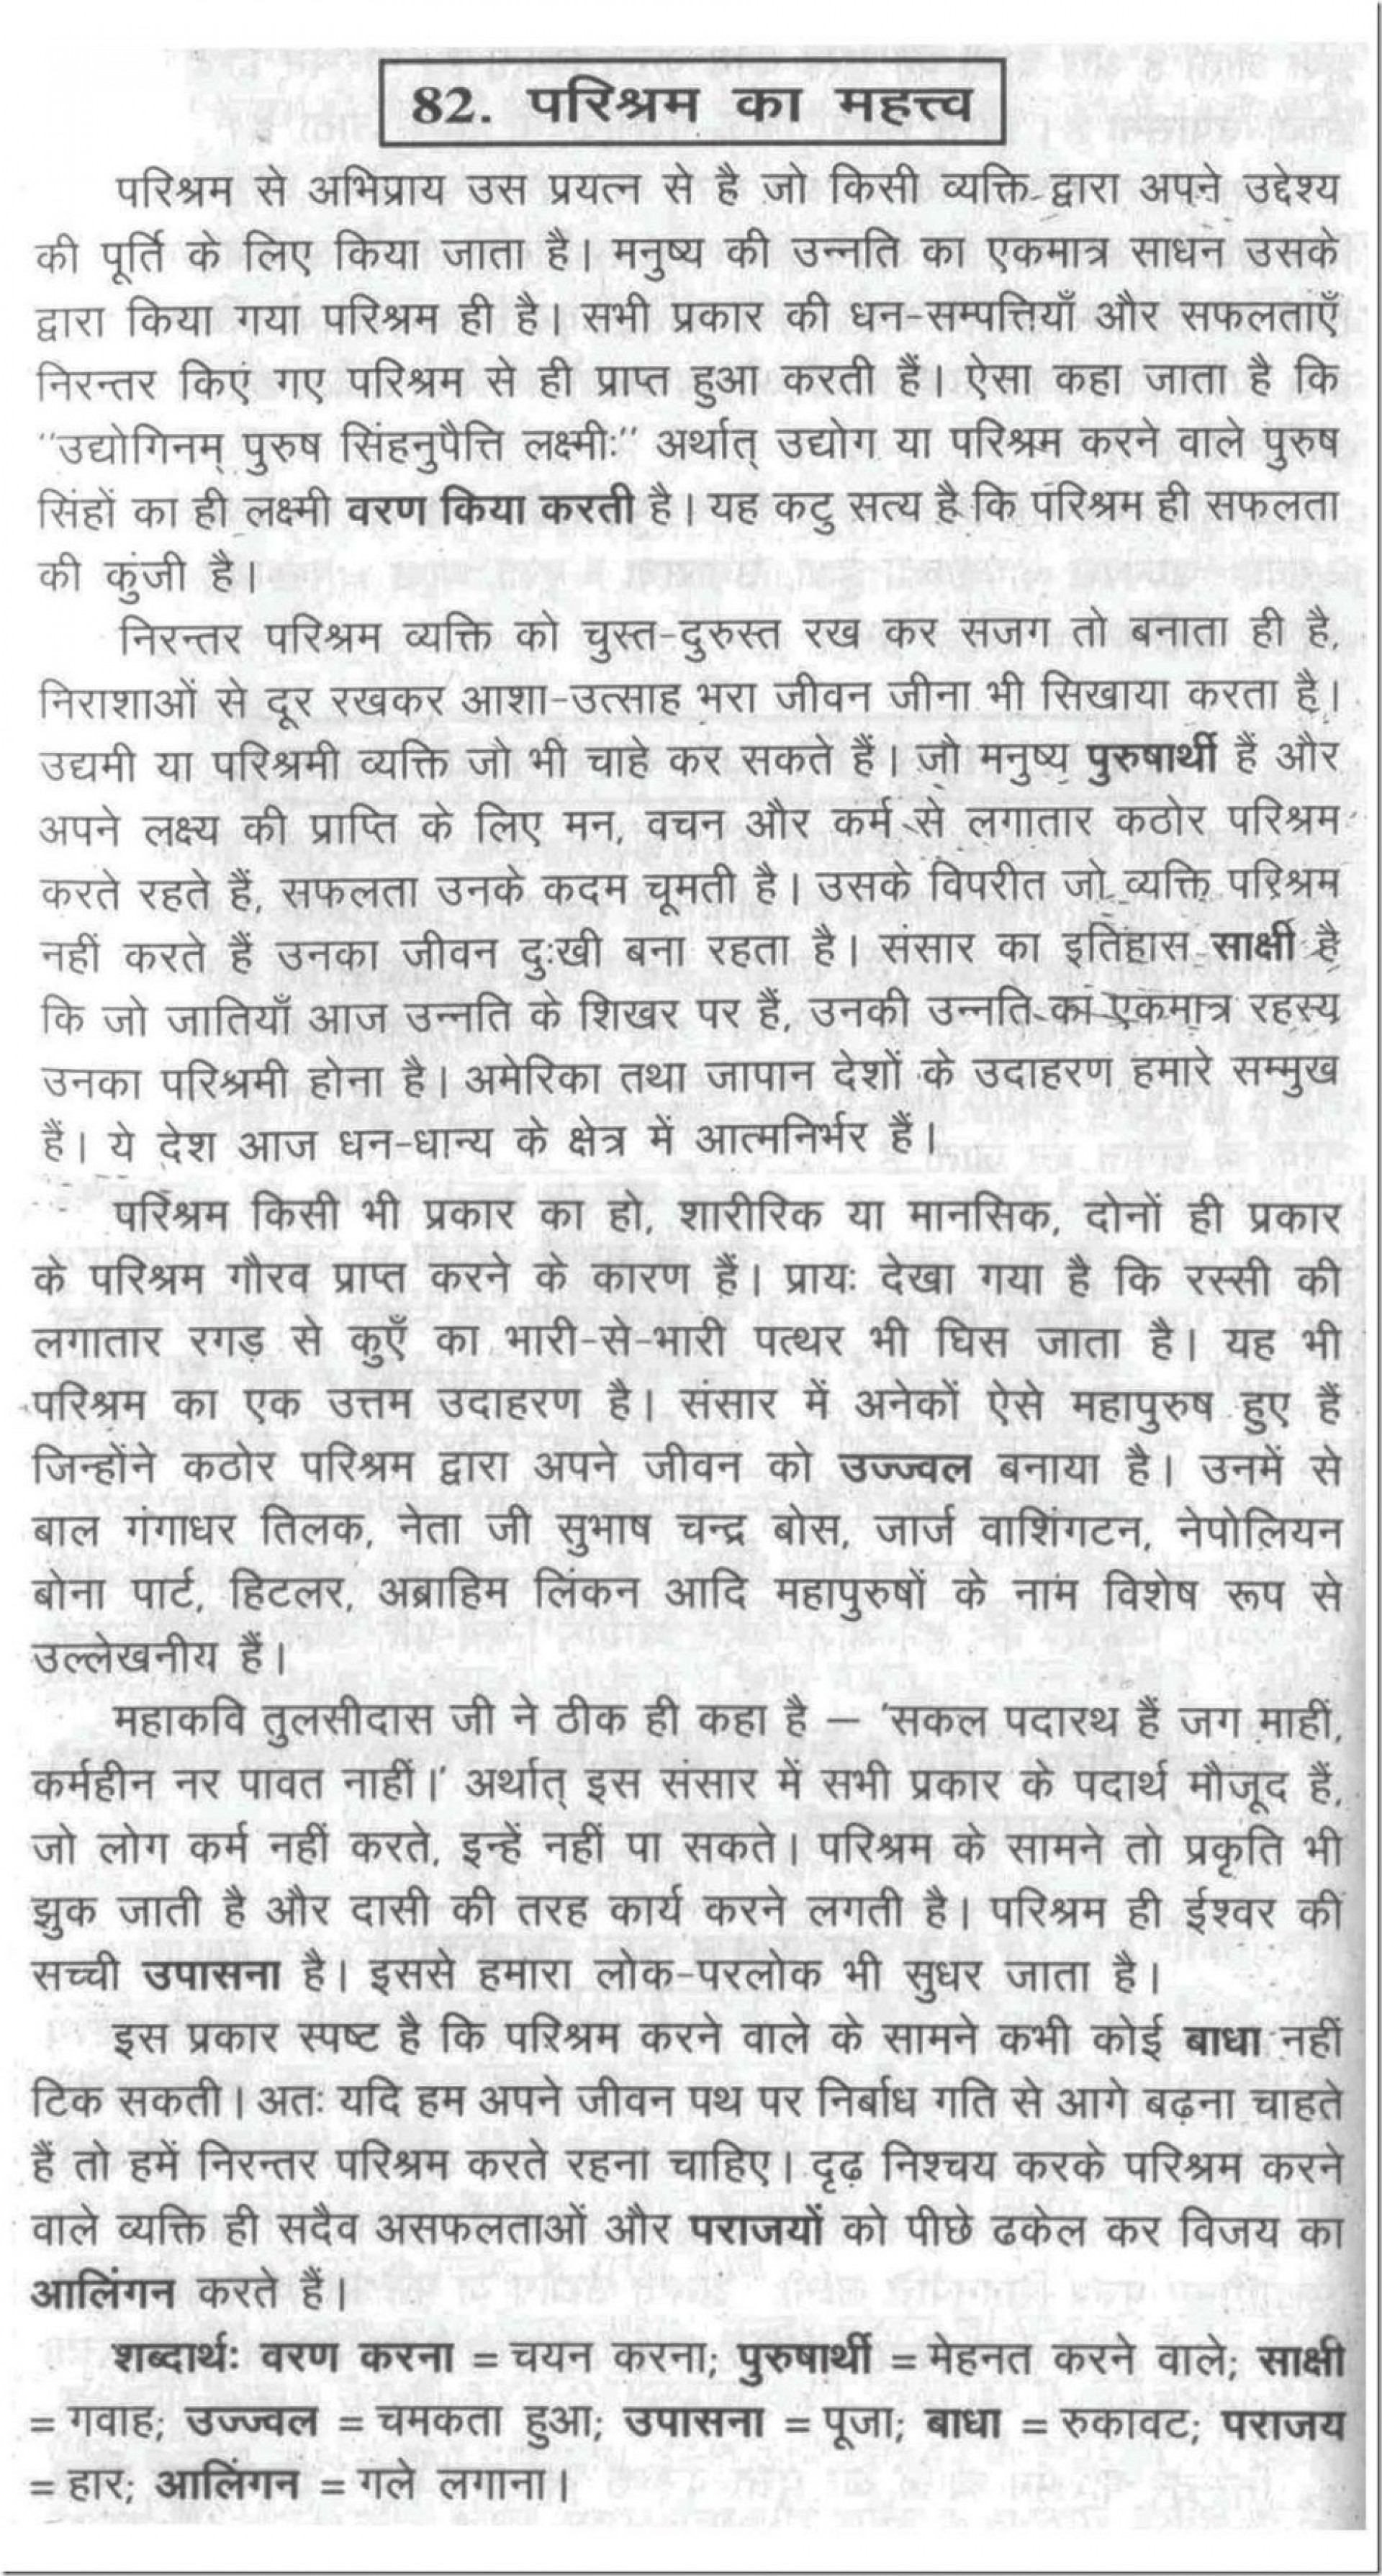 009 Hard Work Essay Thumb On Importance Of Hardwork In Hindi Urdu And Success Determination An Marathi English Is Key To Social Welfare Discourages Language The Punjabi 936x1745 Wonderful Pdf Pays Off Writing 1920